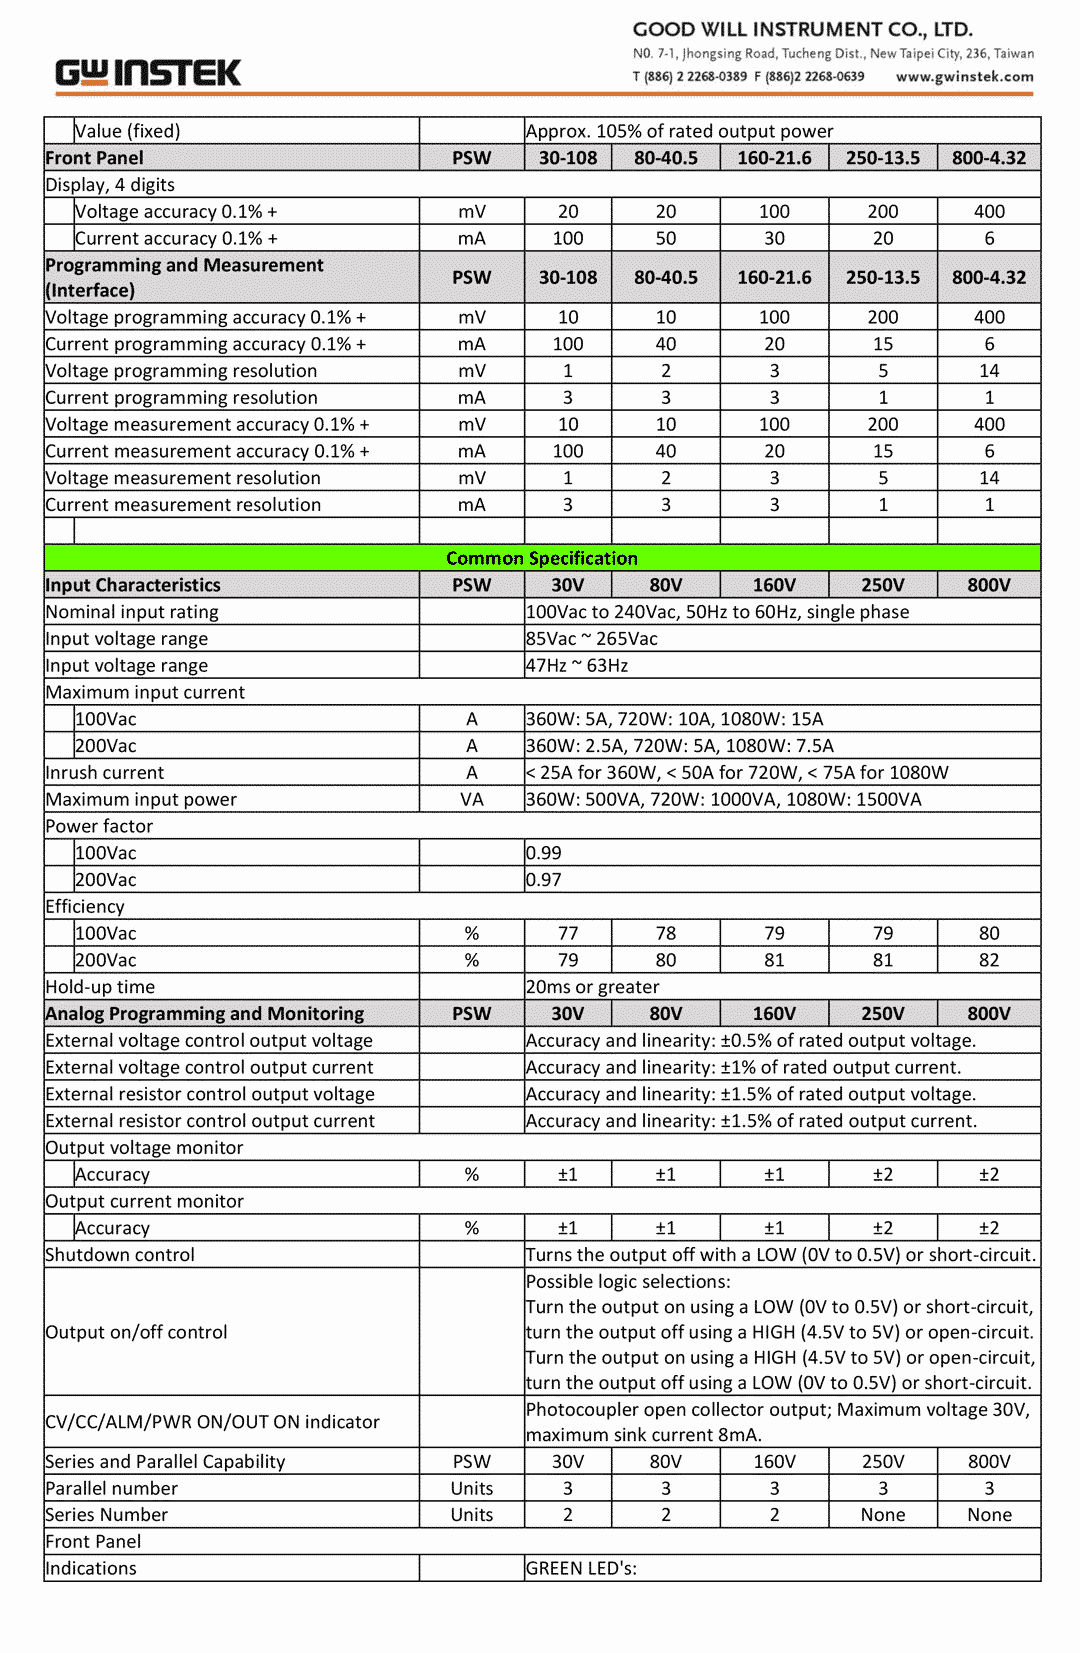 Spec GW Instek PSW 30-36-1